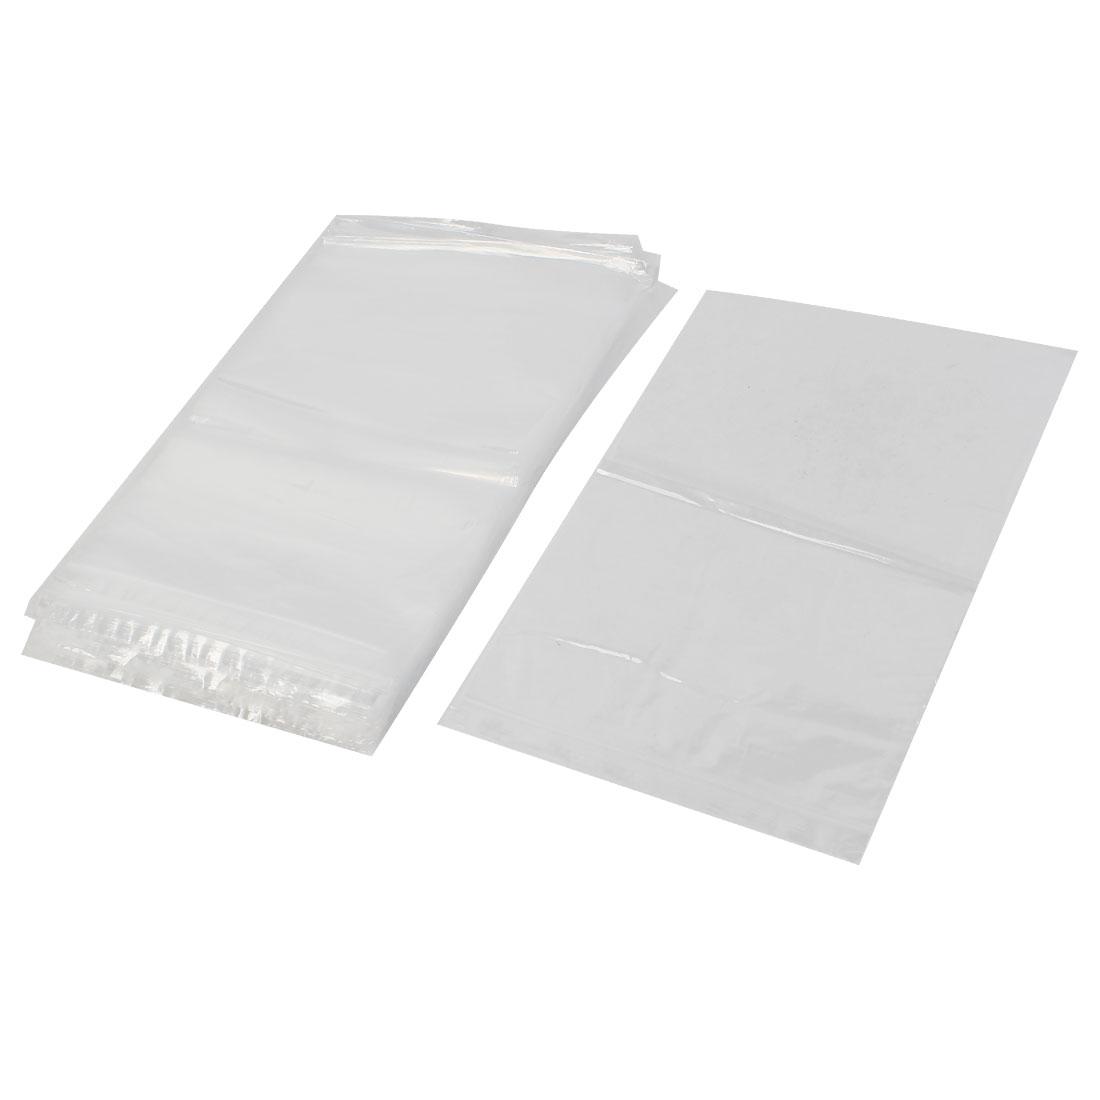 100Pcs 29x40cm Ziplock Bags 2Mil Clear Poly Plastic Reclosable Zip Seal